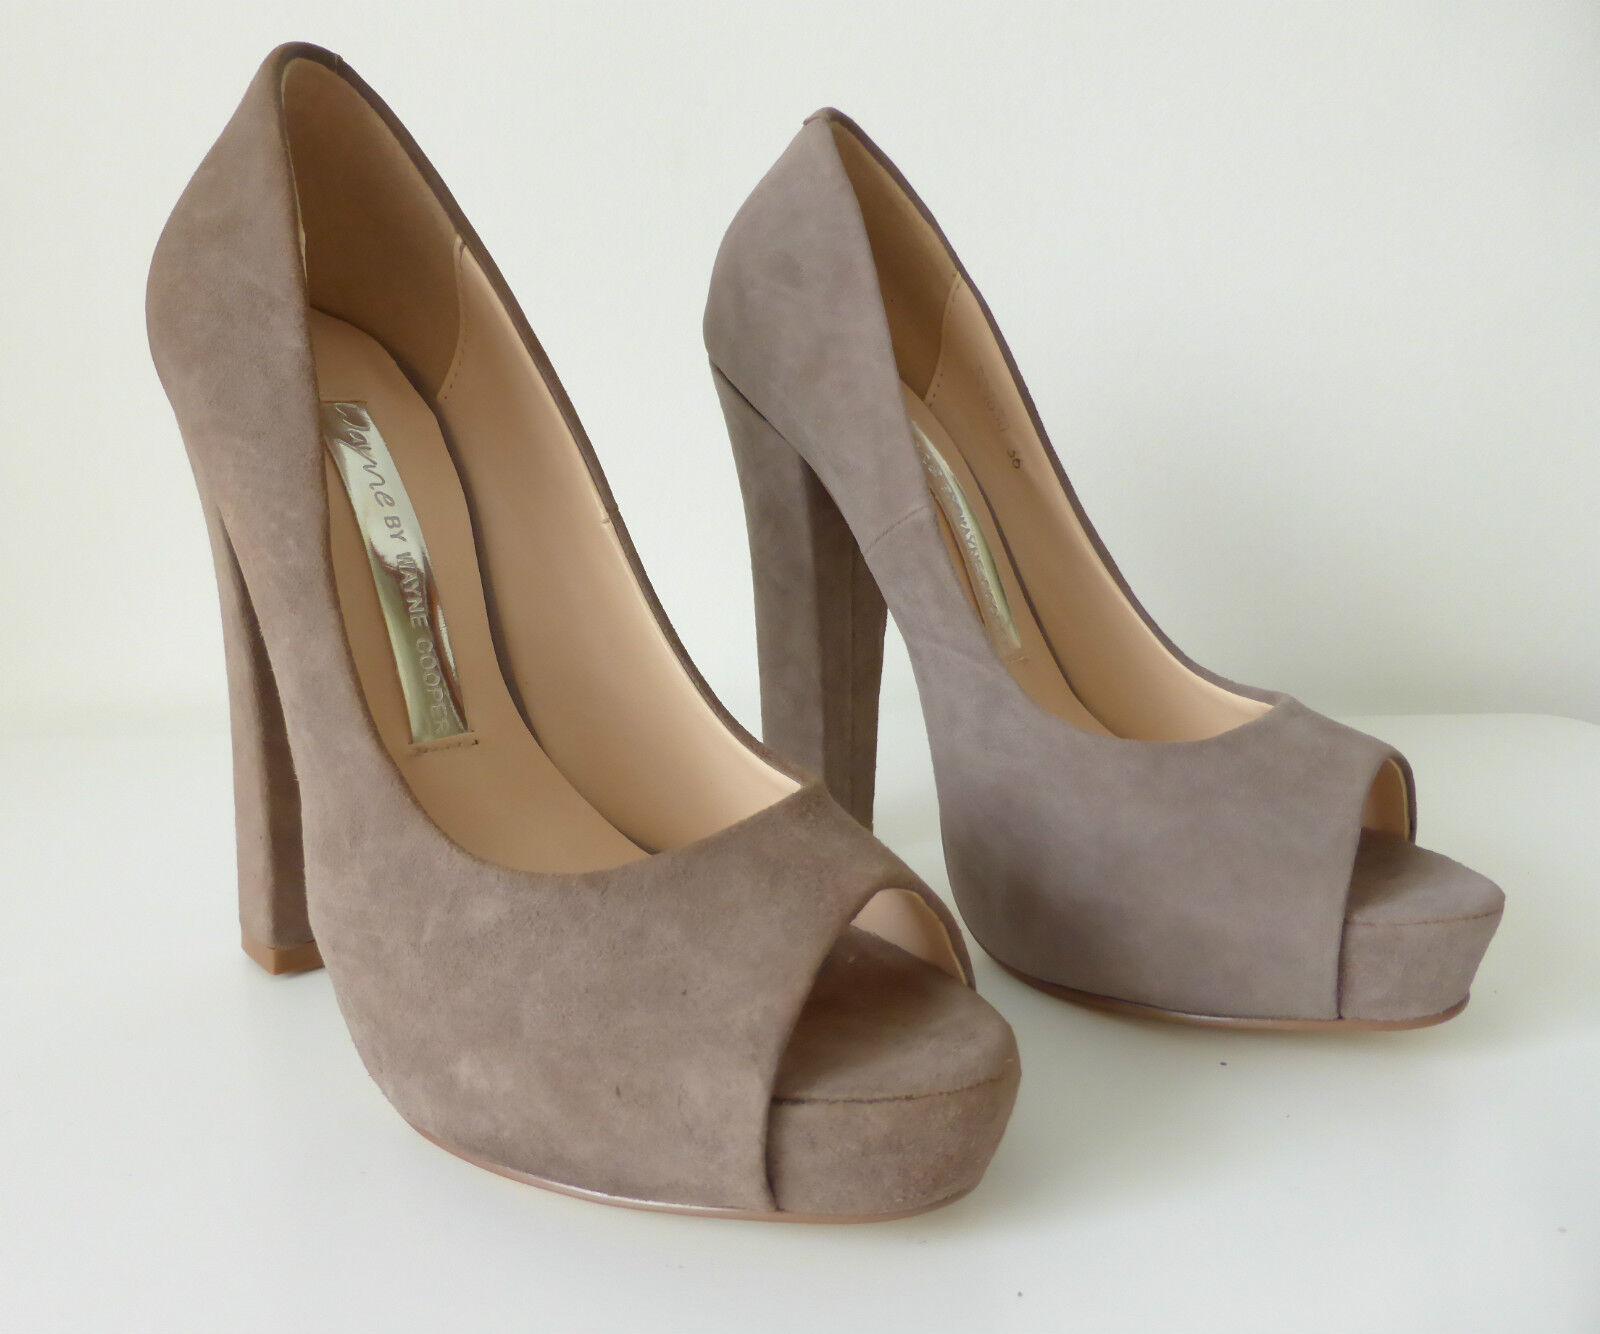 WAYNE COOPER - NWT -  Taille 36 chaussures Suede Peep Toe Block Heel Pumps